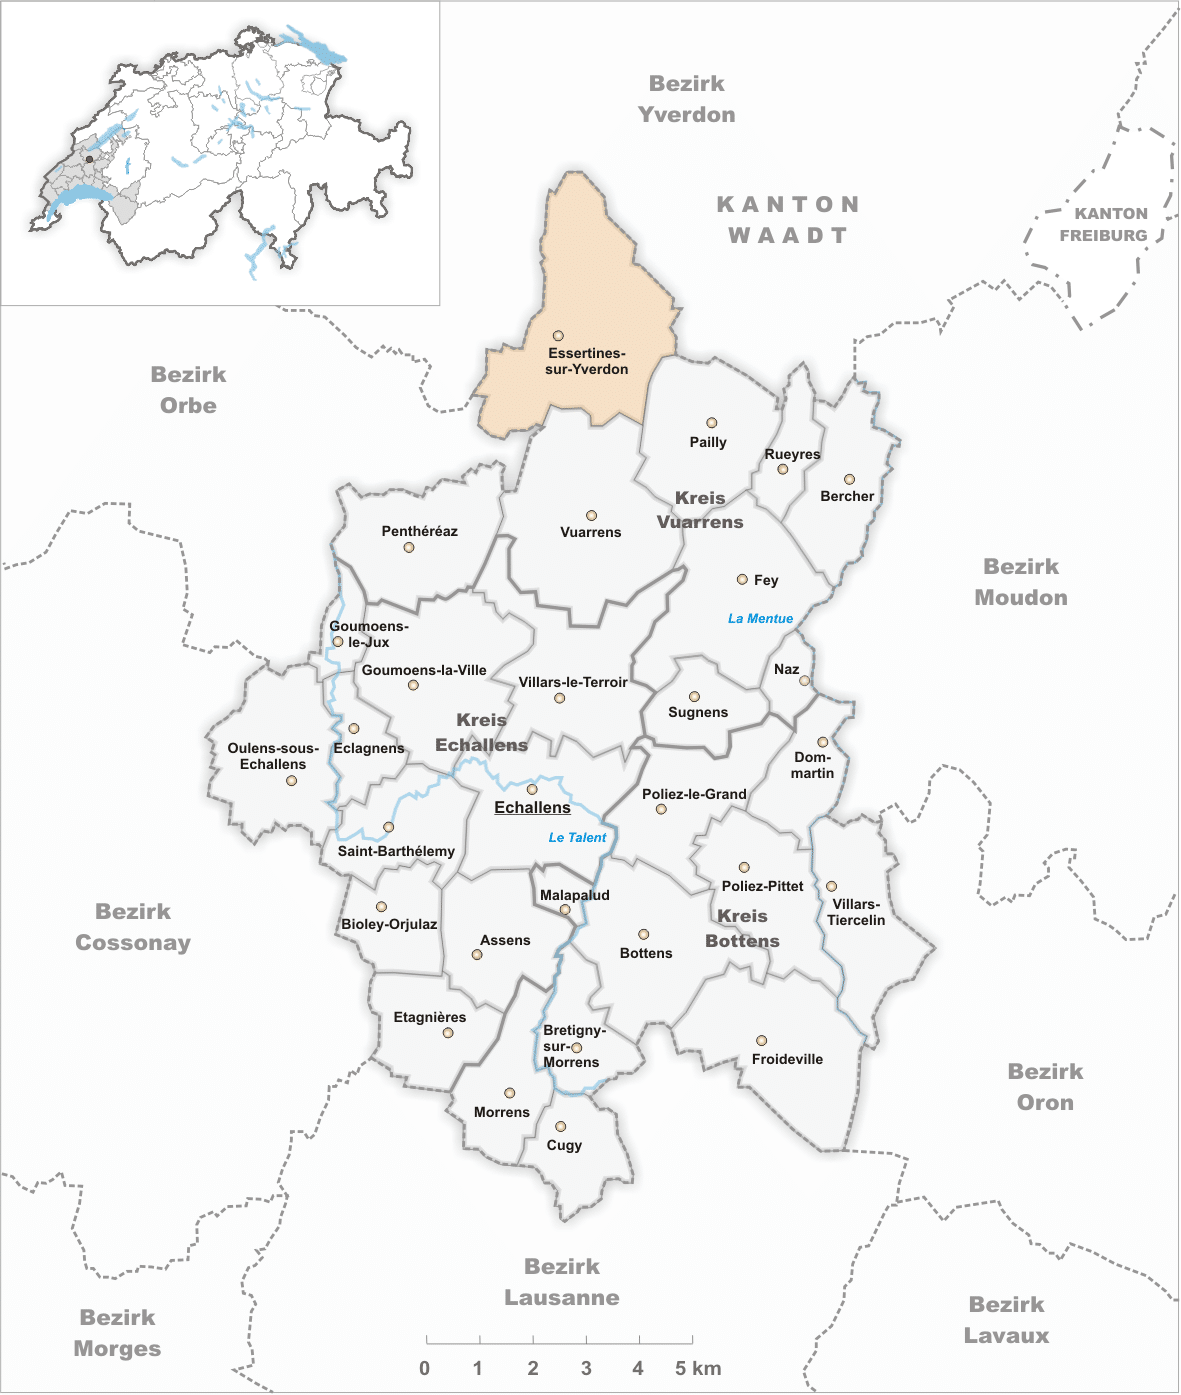 Essertines-sur-Yverdon